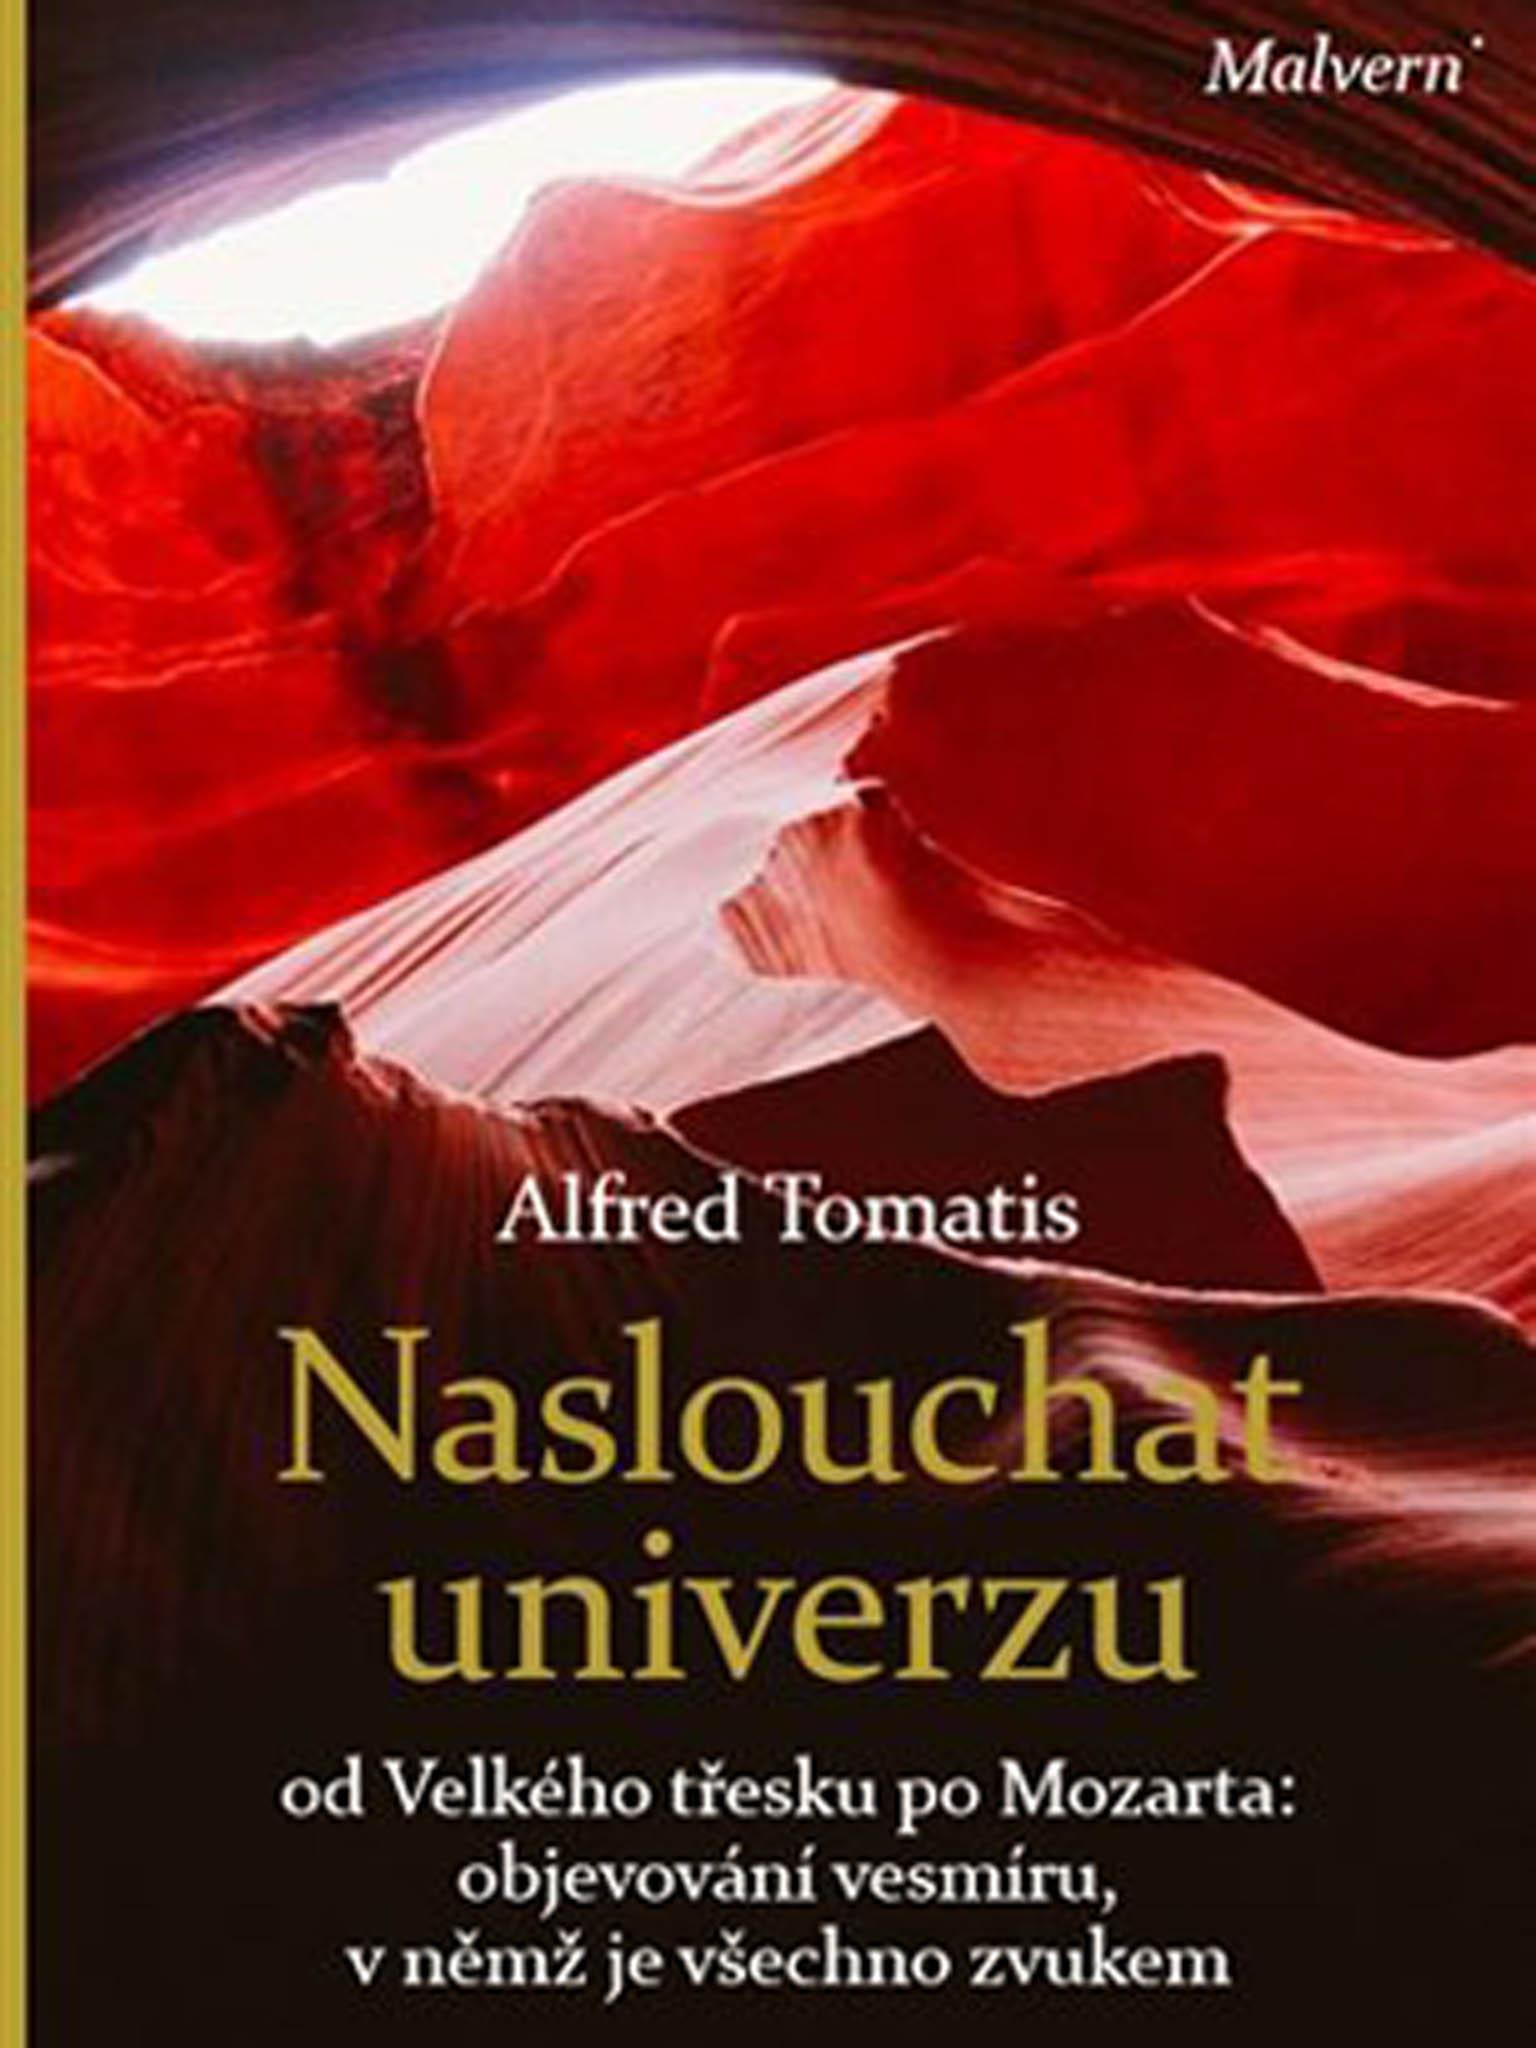 Alfred A. Tomatis: Naslouchat univerzu, Malvern, 2017